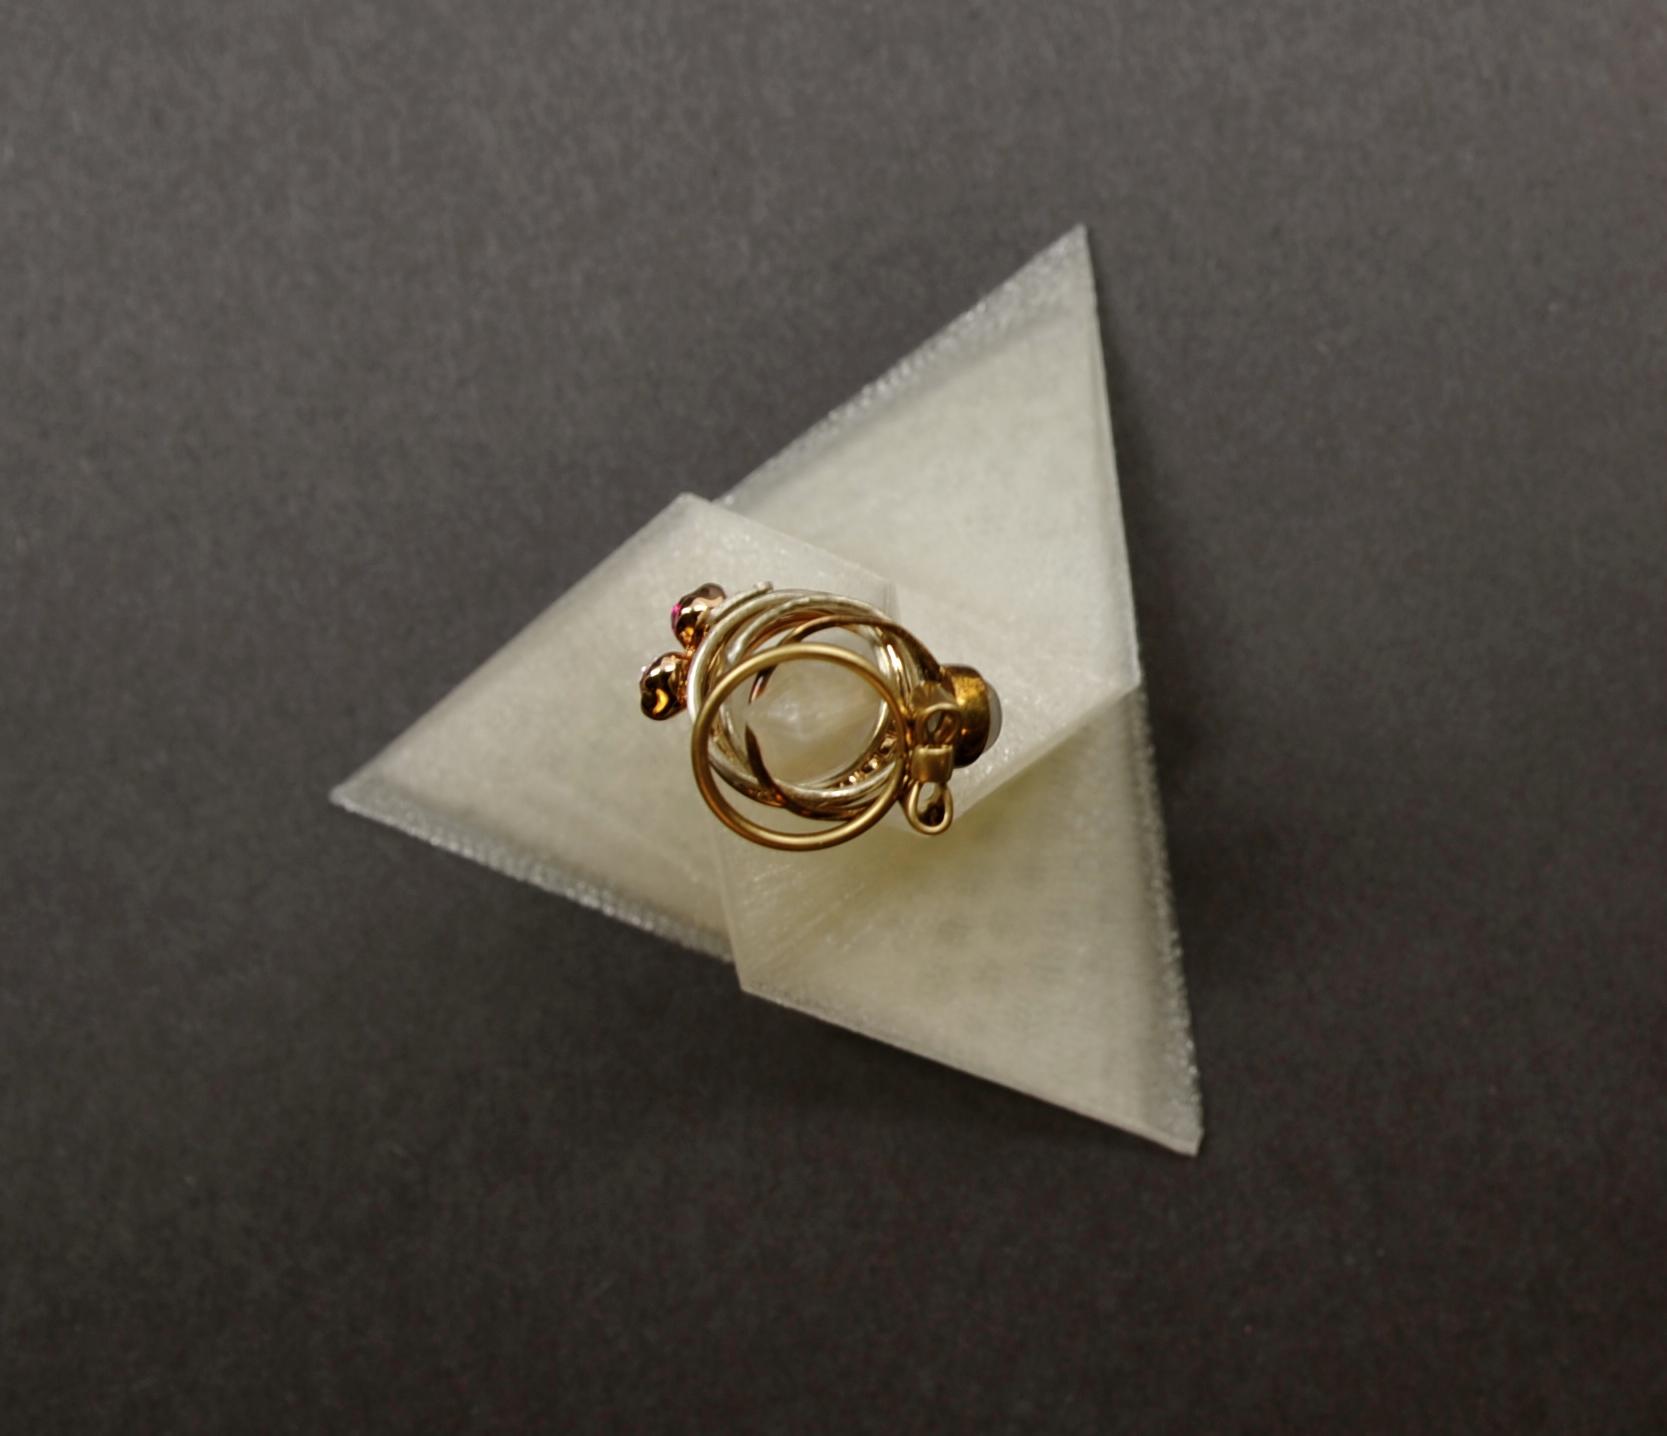 3D Printed Sculpture/ Ring Holder